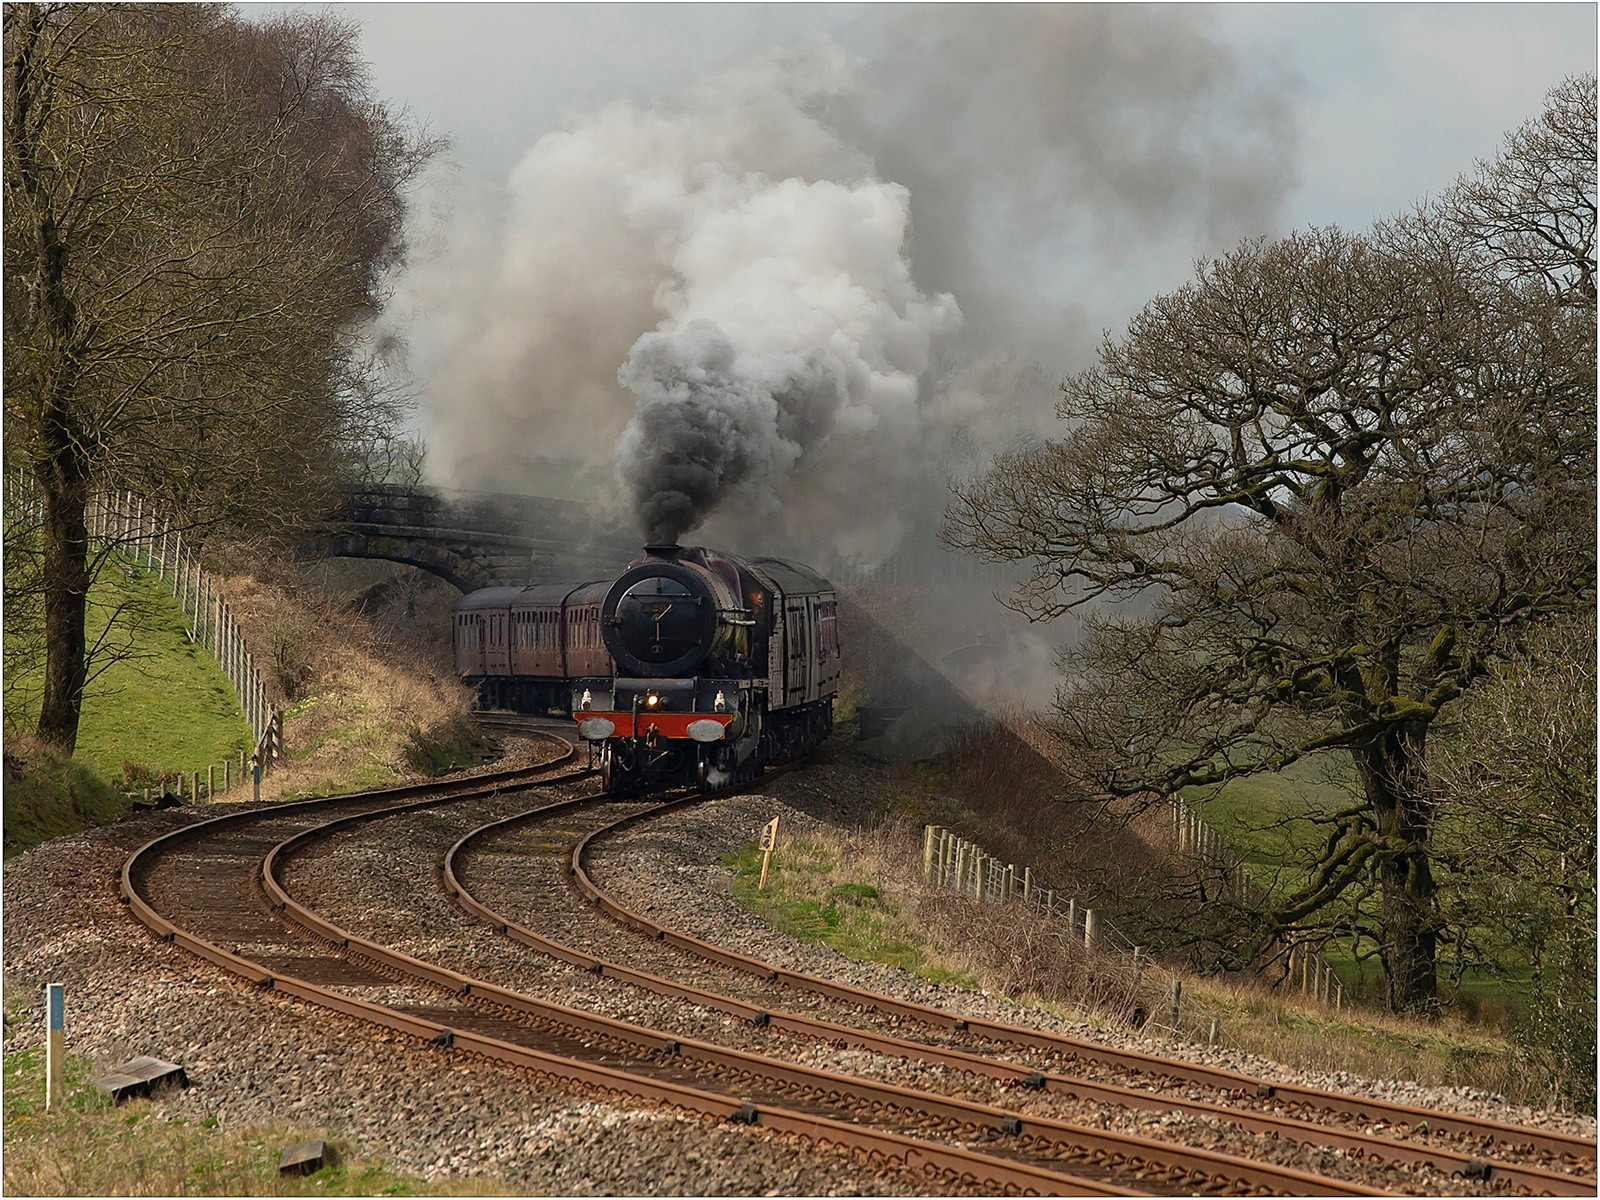 6201 Princess Elizabeth near Clapham